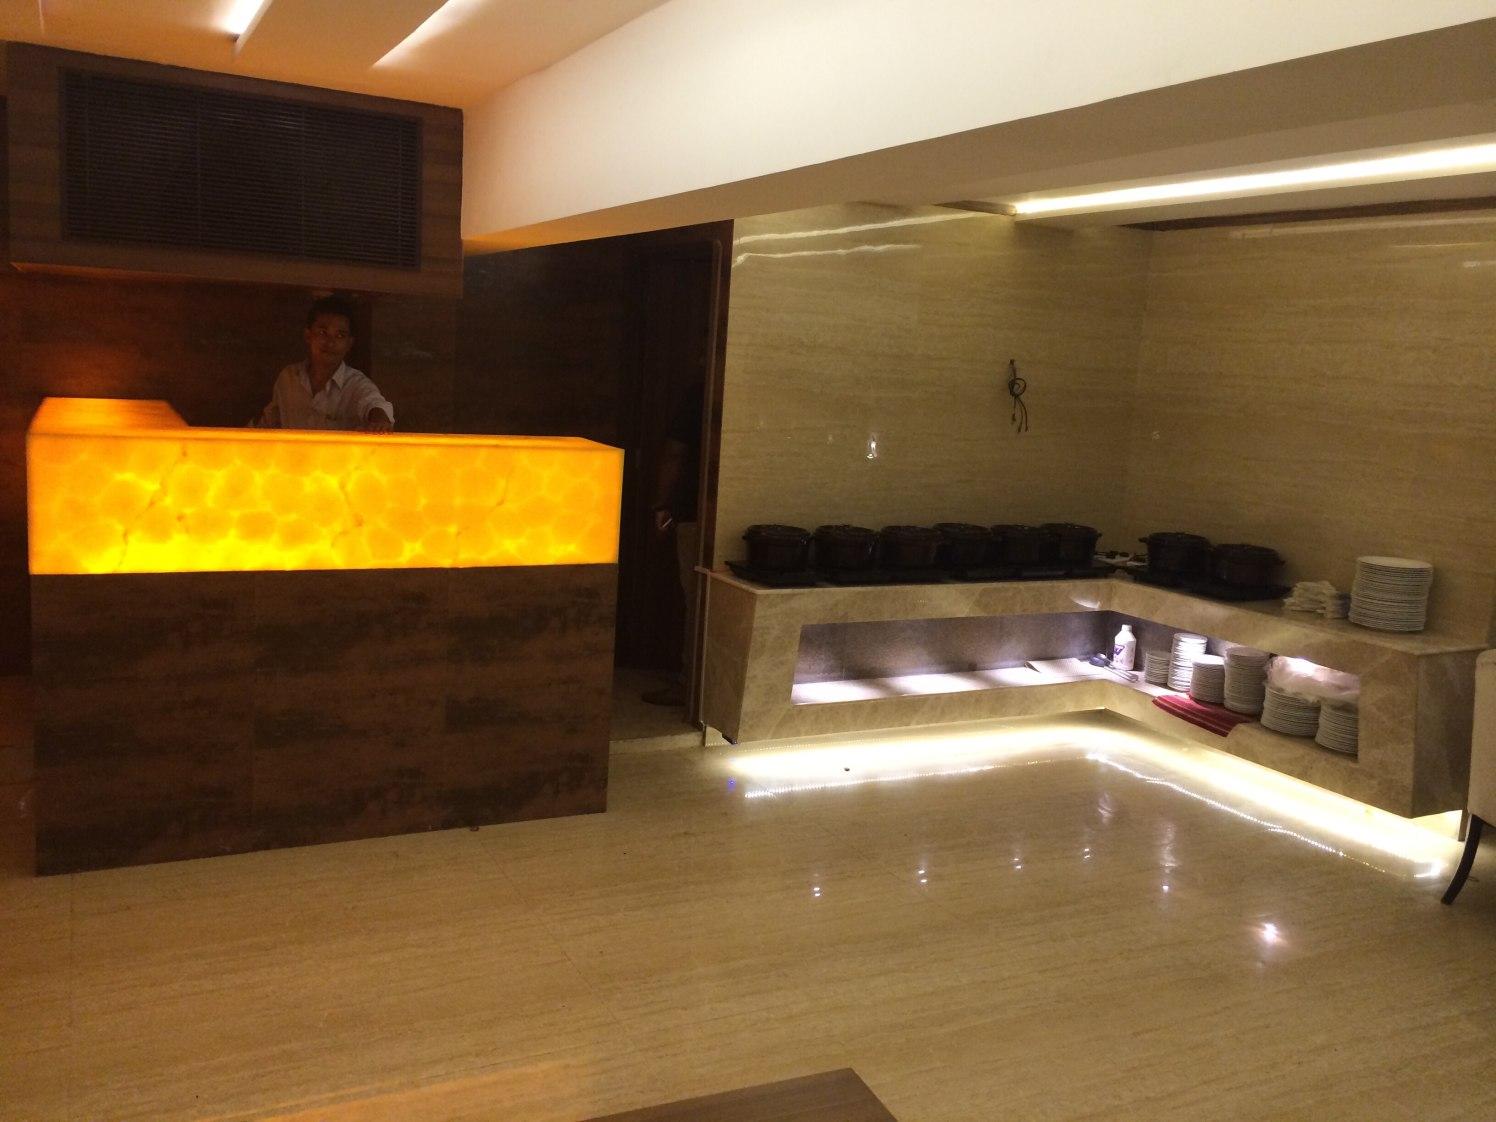 Stylish Reception by Devesh Gajwani Modern | Interior Design Photos & Ideas